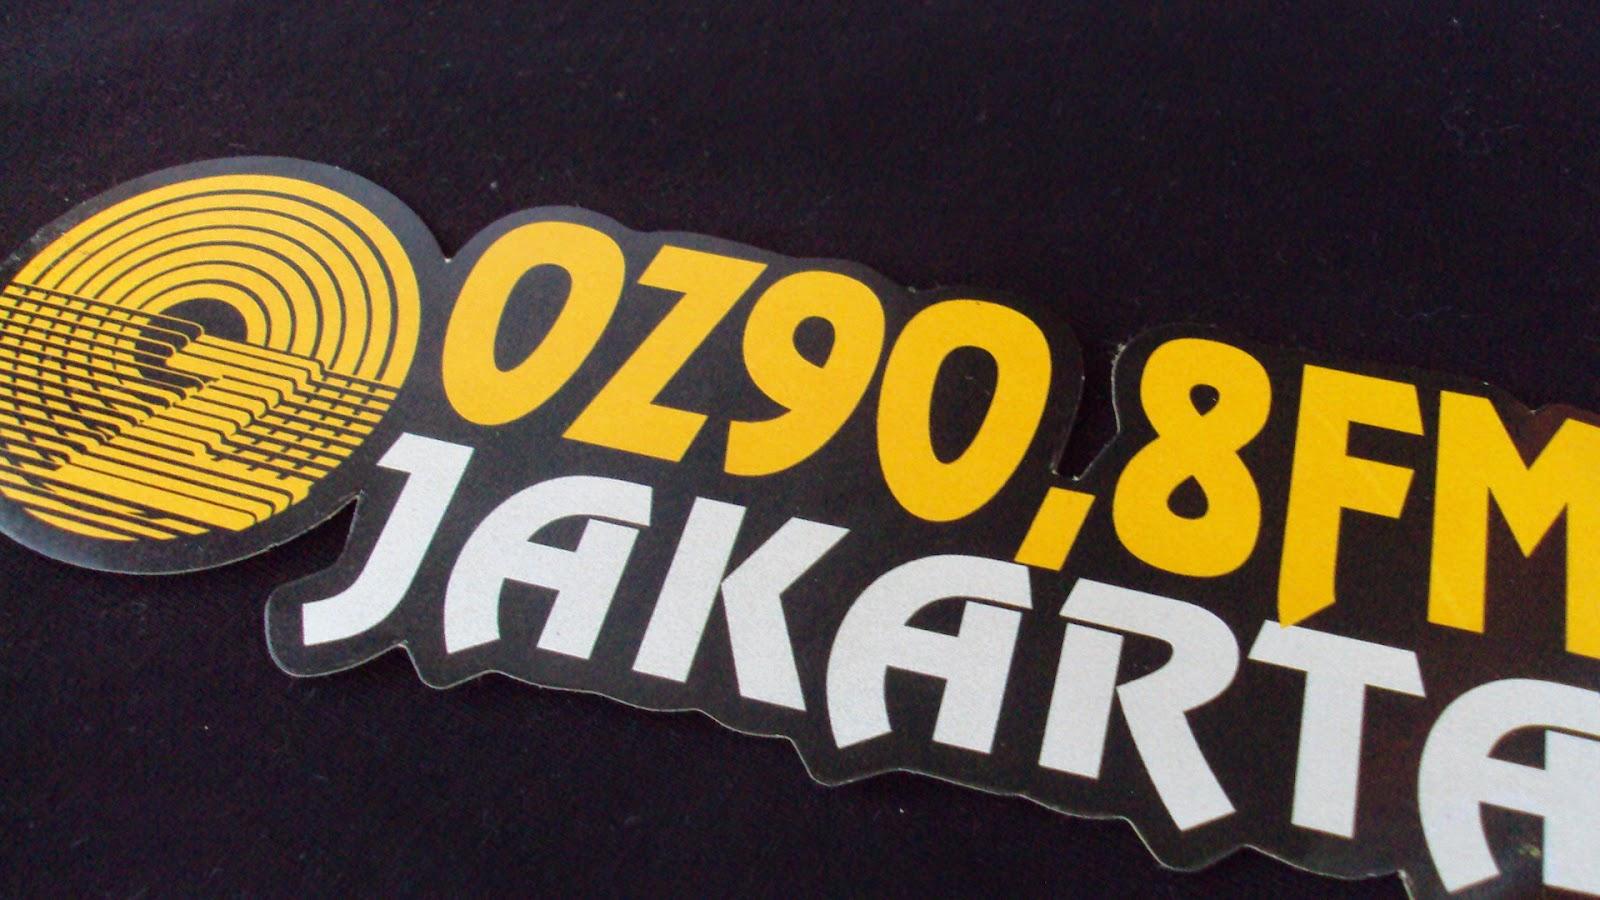 OZ Radio 90.8 FM